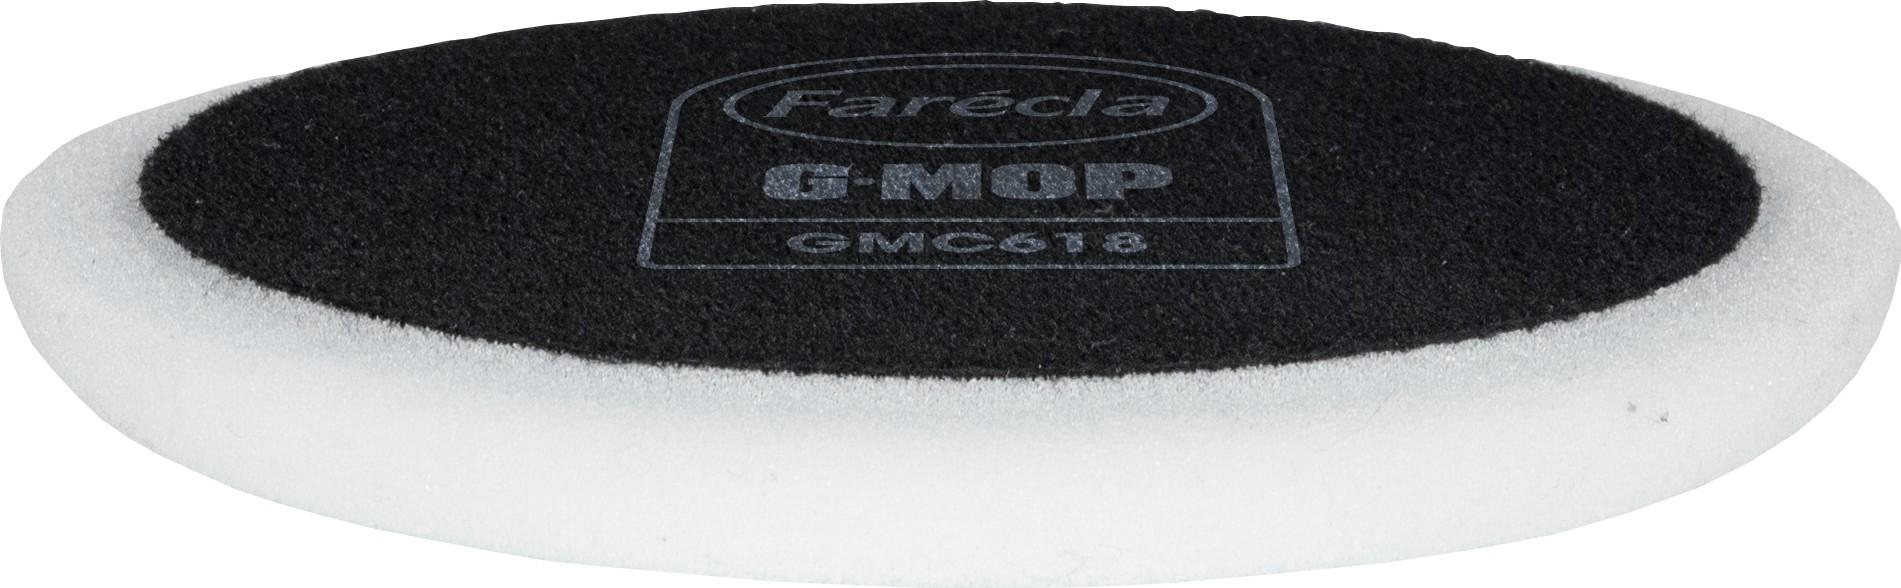 G3 Regular Grade Paste 1,0kg